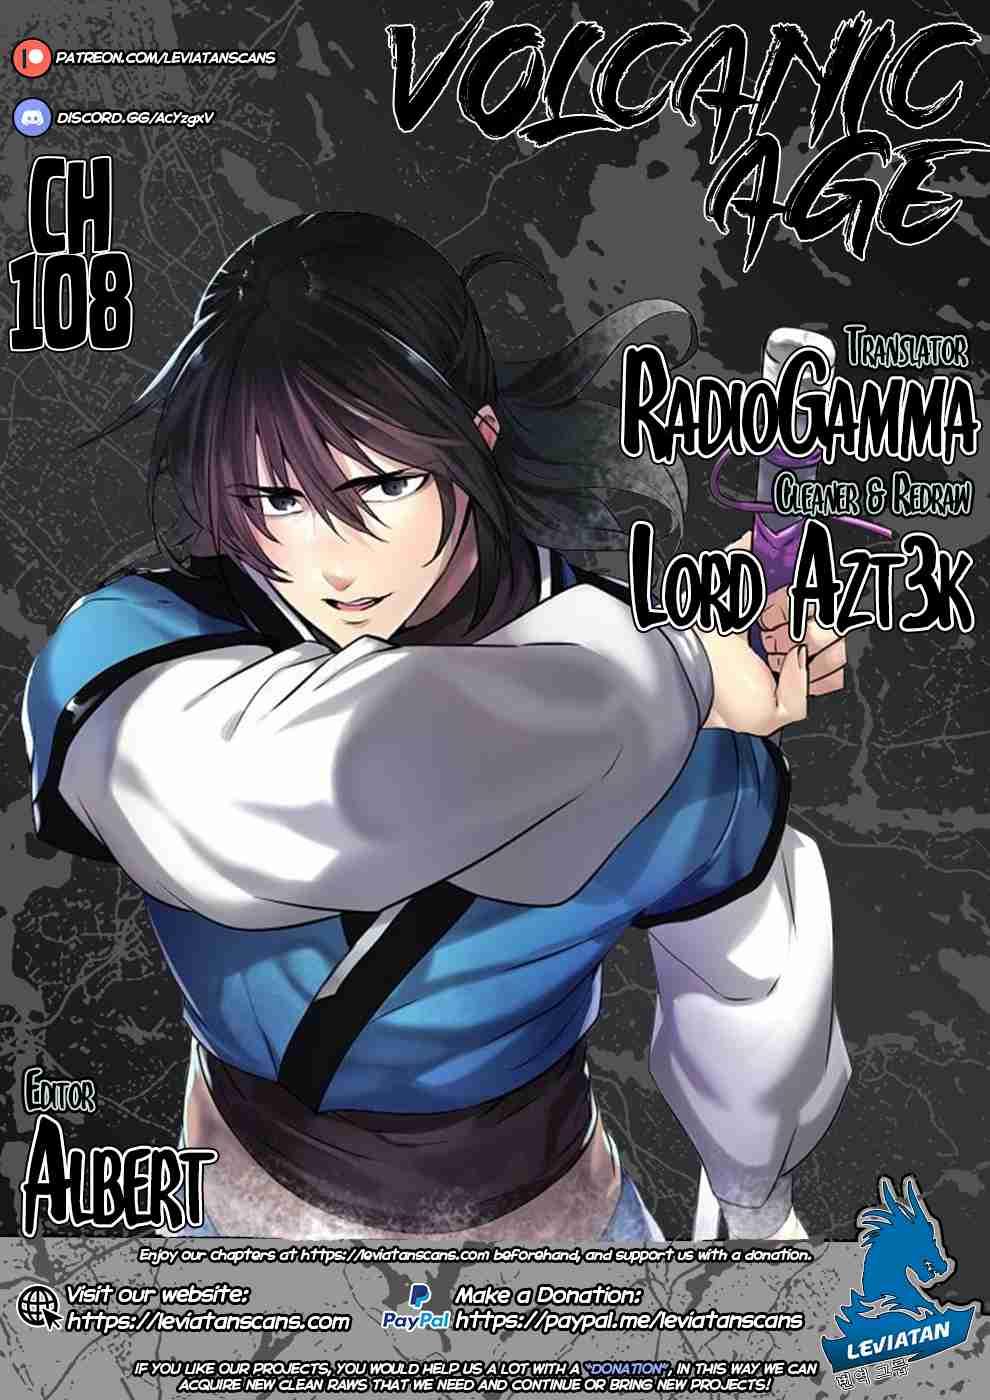 https://manga.mangadogs.com/comics/pic2/2/20226/933006/10811f679796b10f532598bd1a3839bb.jpg Page 1